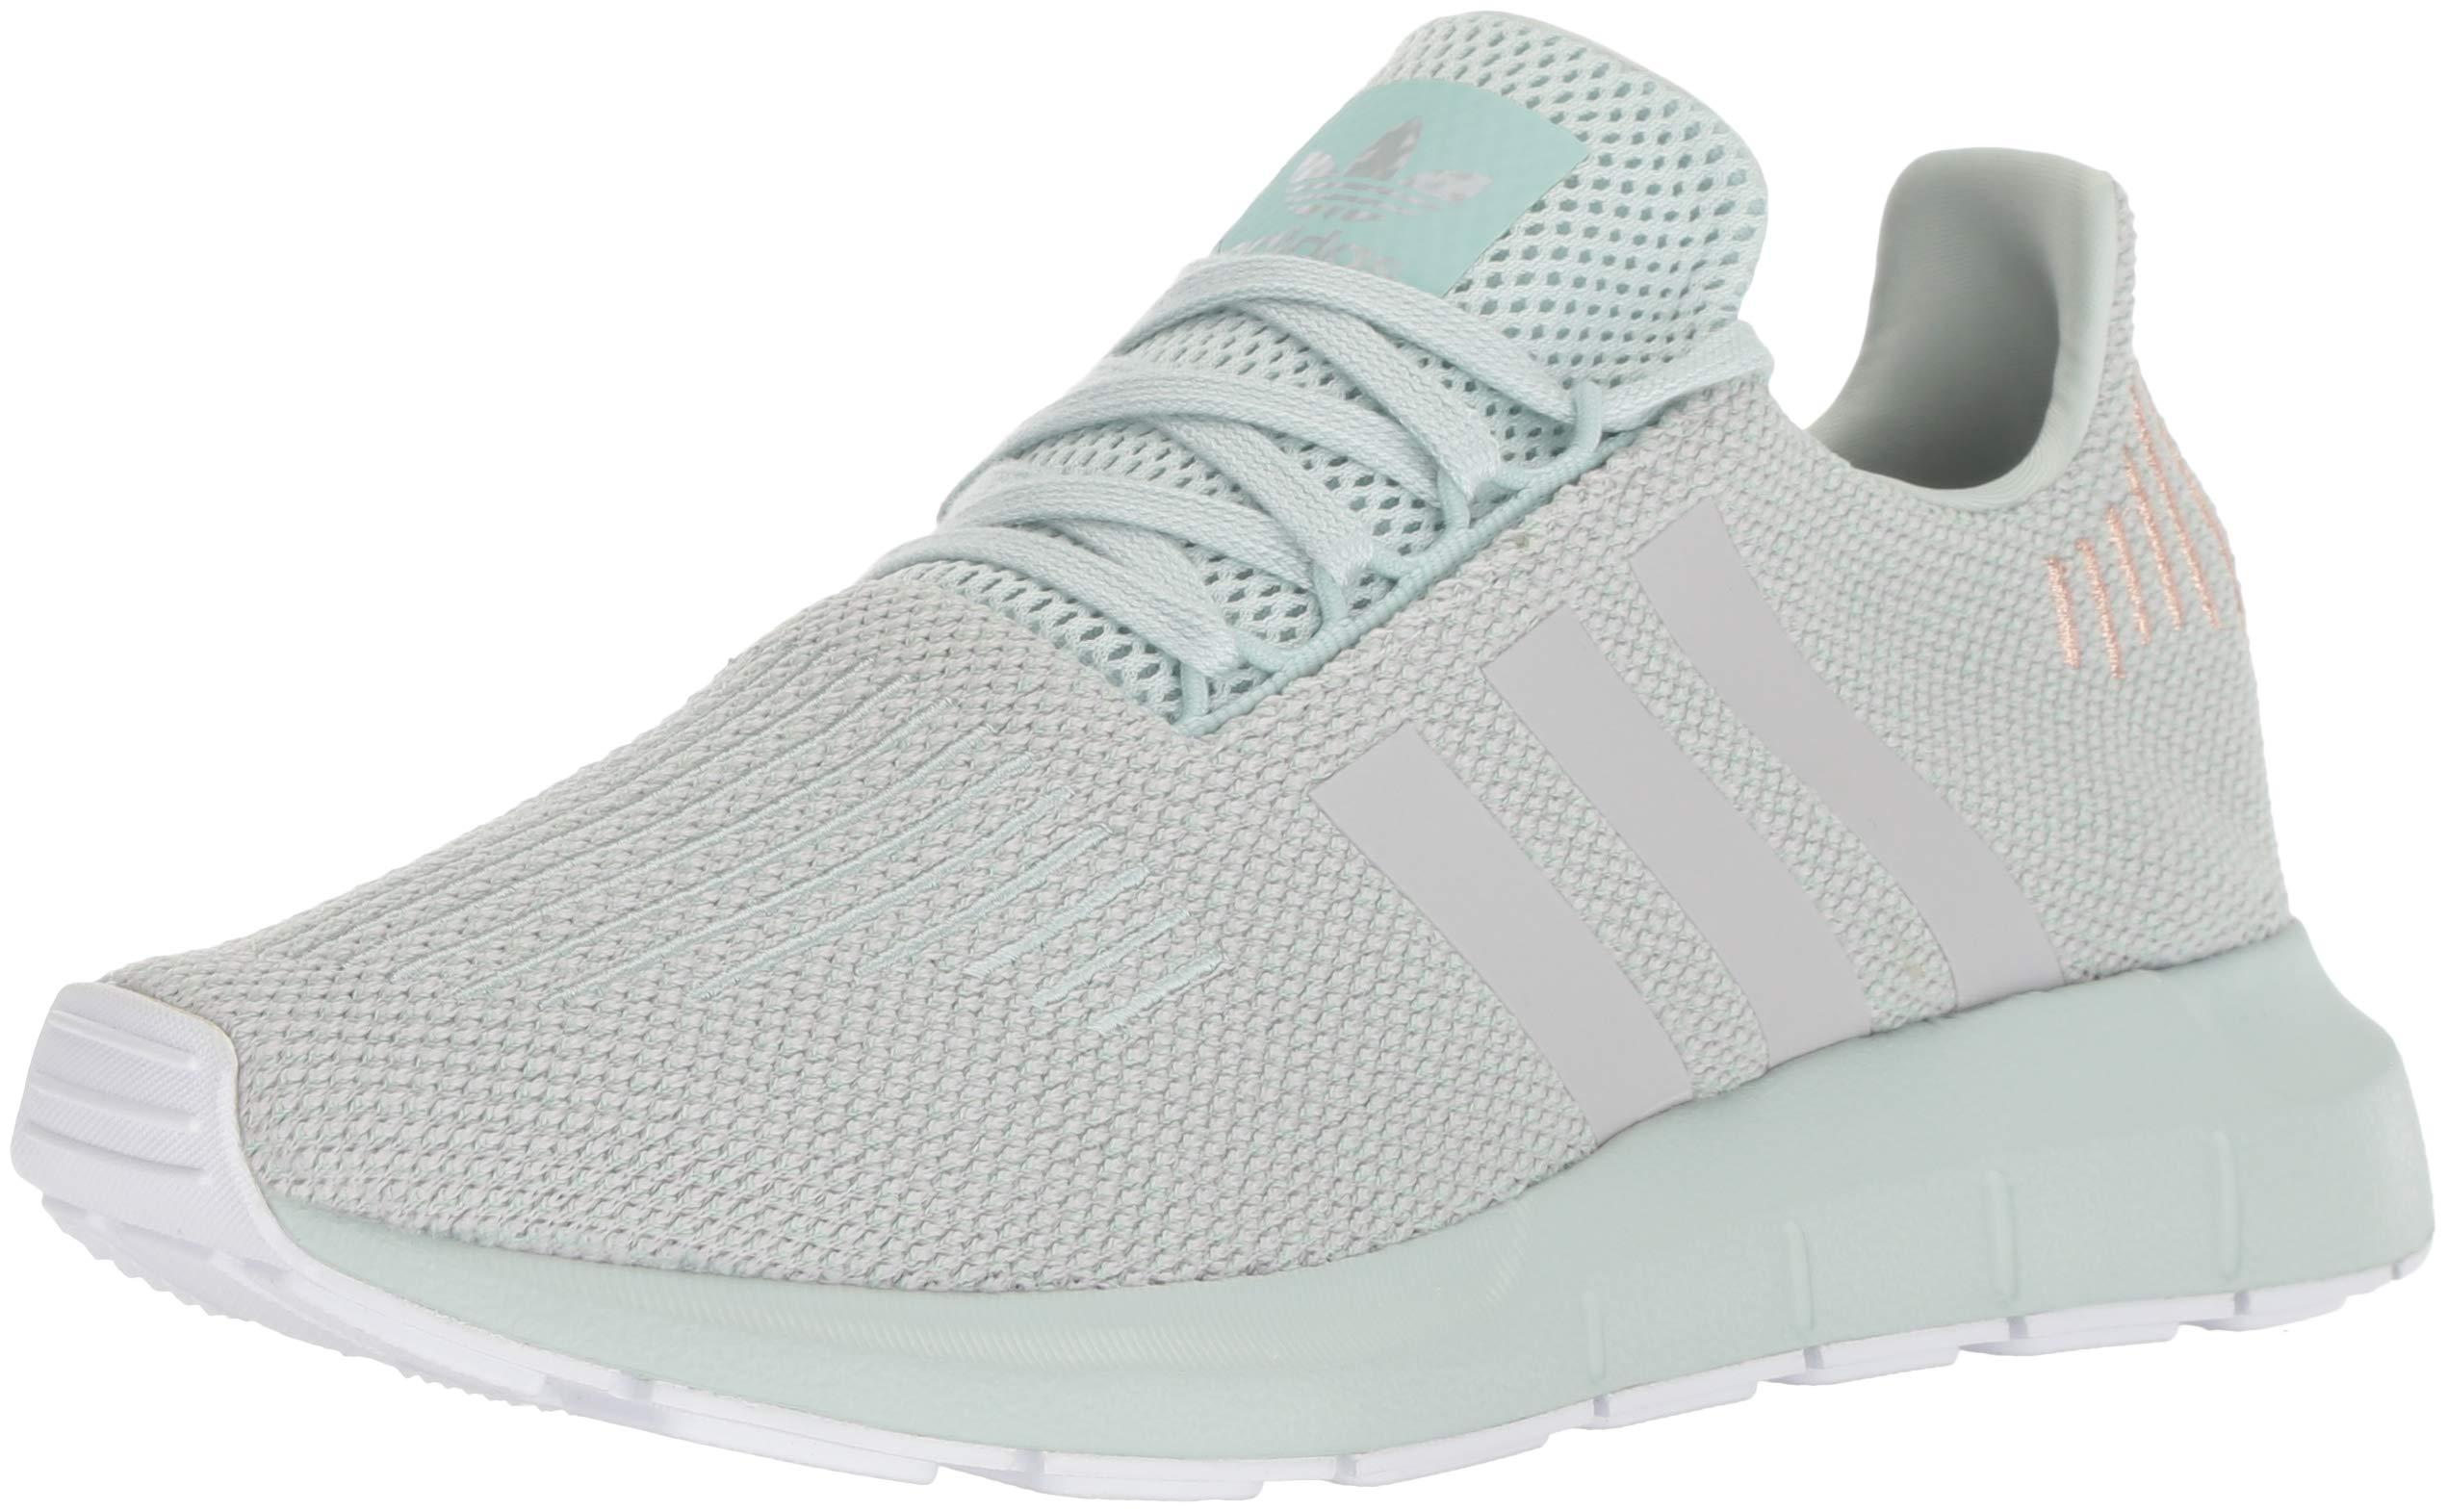 adidas Originals Women's Swift Running Shoe, Vapour Green/Grey/White, 9.5 M US